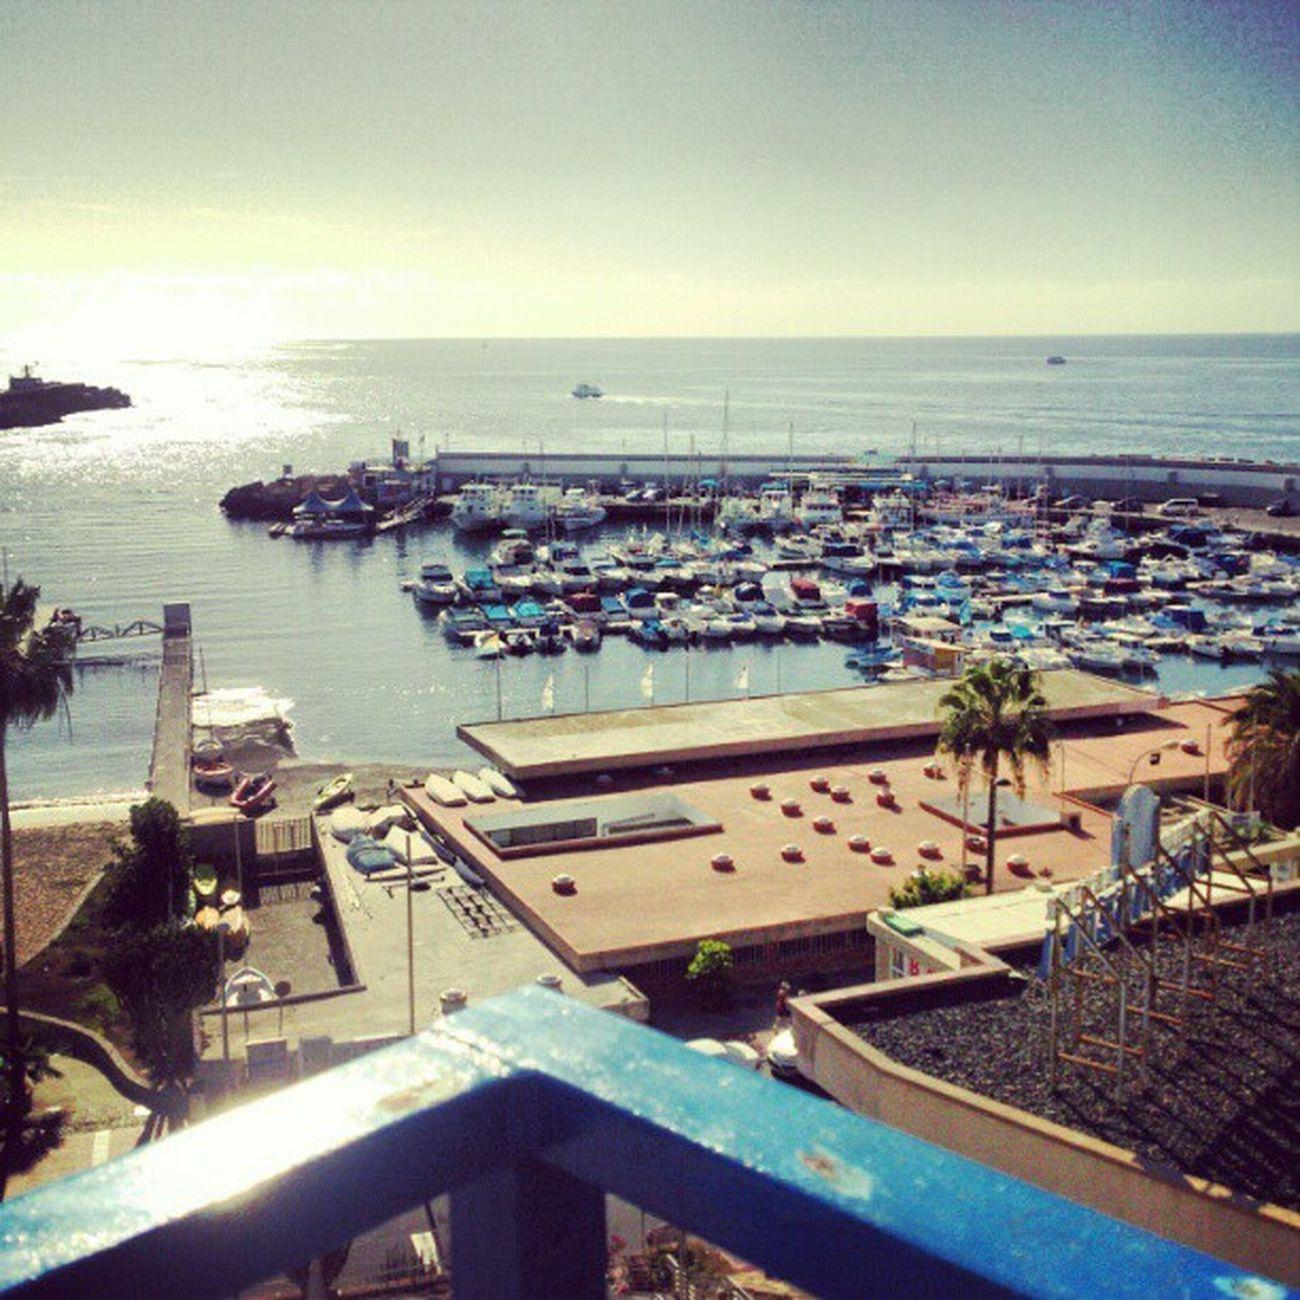 Puerto Rico, Gran Canaria Puertorico Mog án GranCanaria Canarias IslasCanarias CanaryIslands Puerto Playa Port Beach Bay Sol Sun Sunny SunnyDay